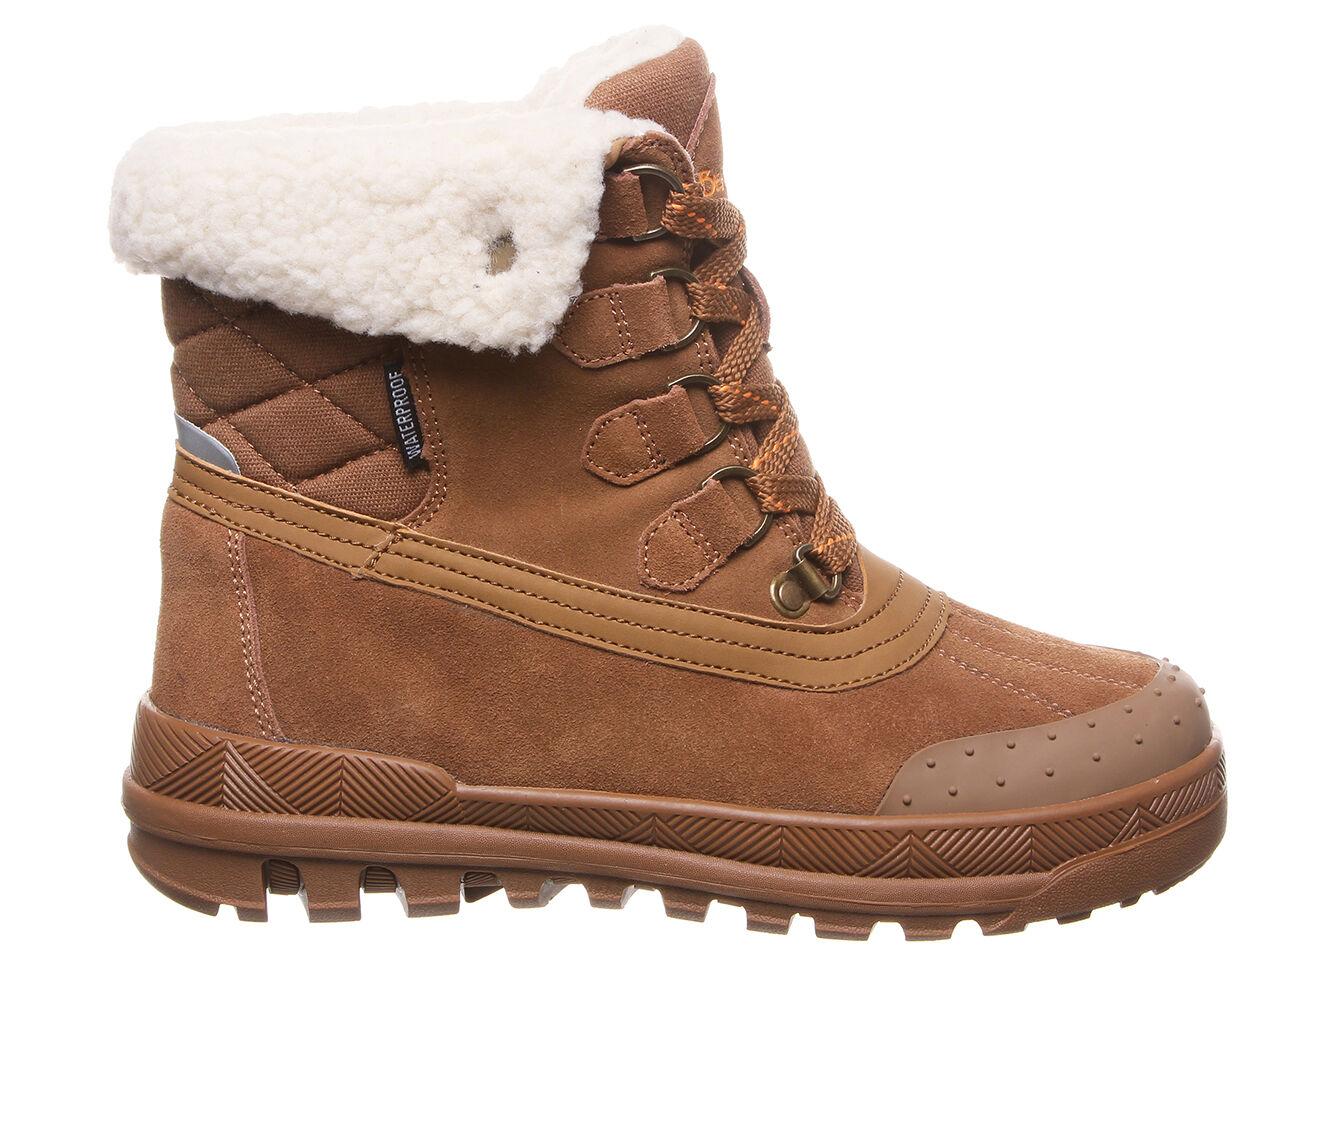 Delicate styles Women's Bearpaw Inka Winter Boots Hickory